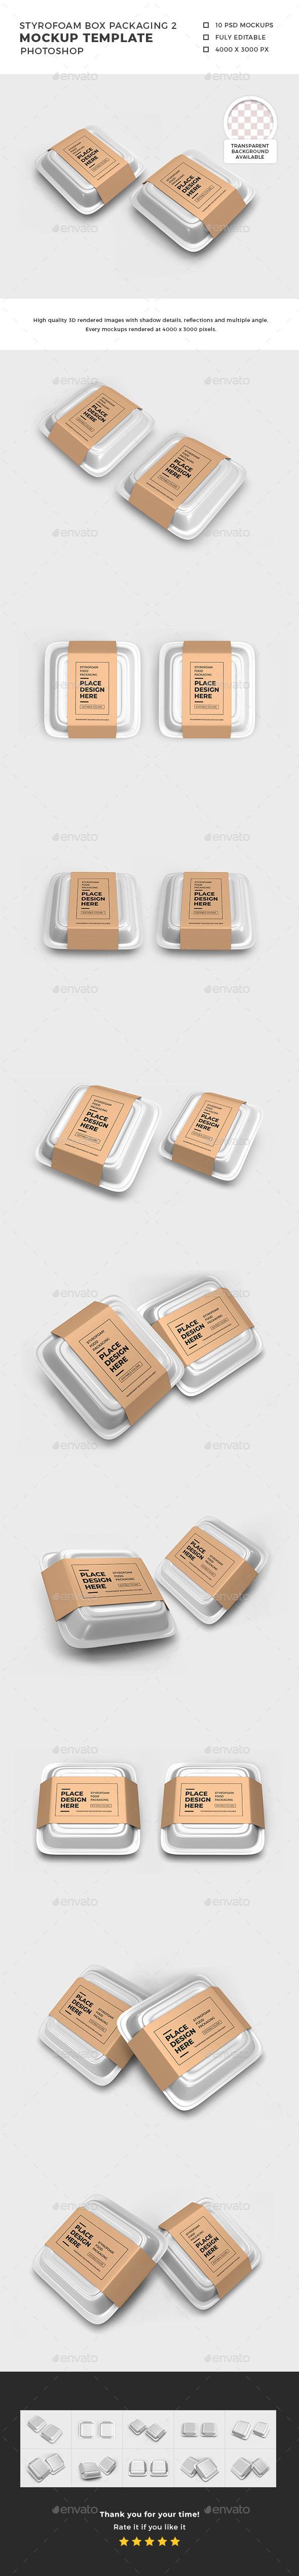 Styrofoam Box Packaging Mockup Template 2